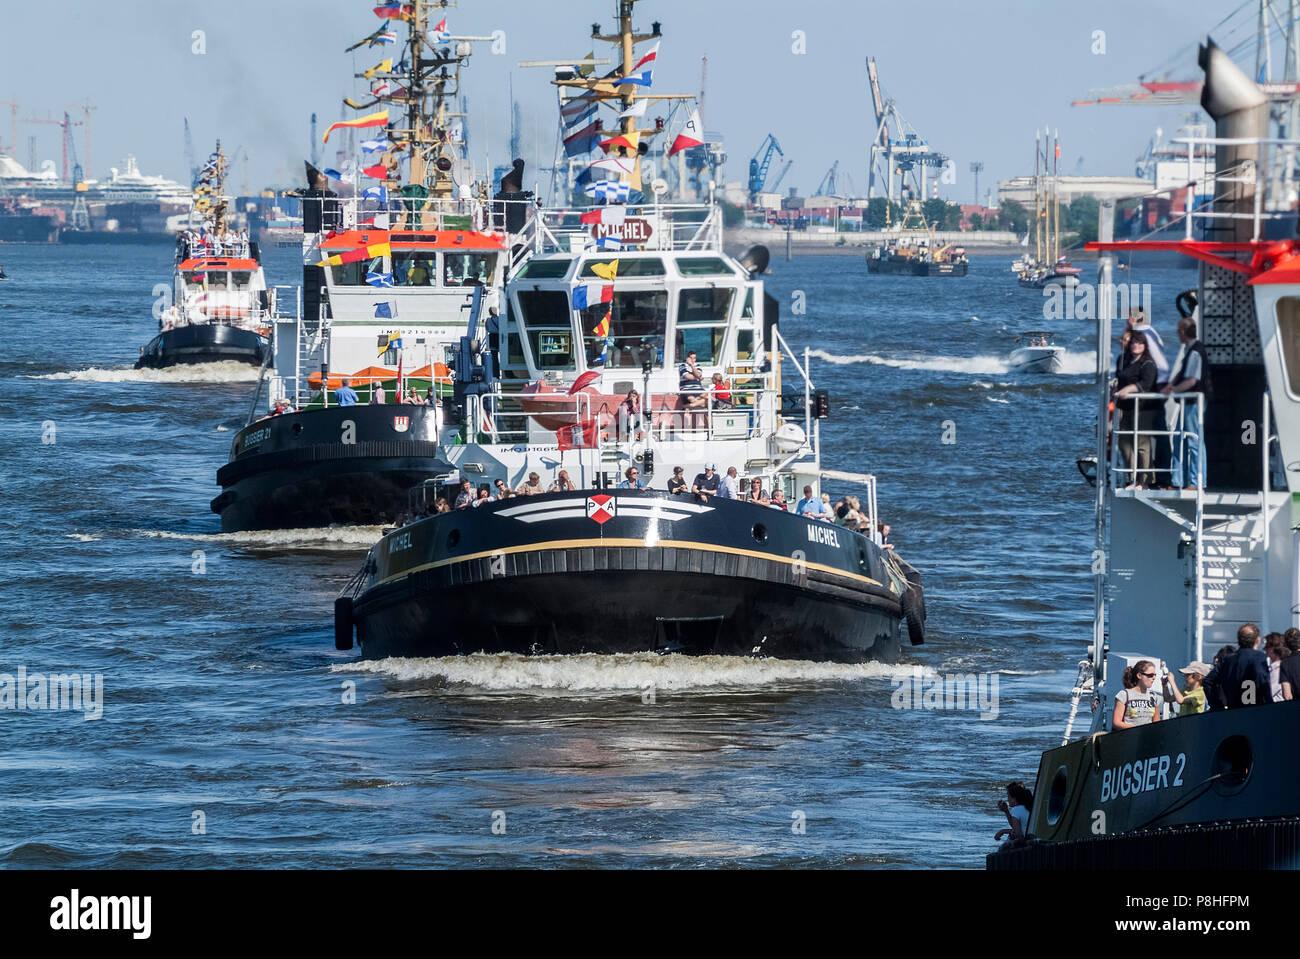 Hafengeburtstag in Hamburg. Schlepper tanzen auf der Elbe. Harbor birthday in Hamburg. Tugs are dancing on the Elbe. - Stock Image